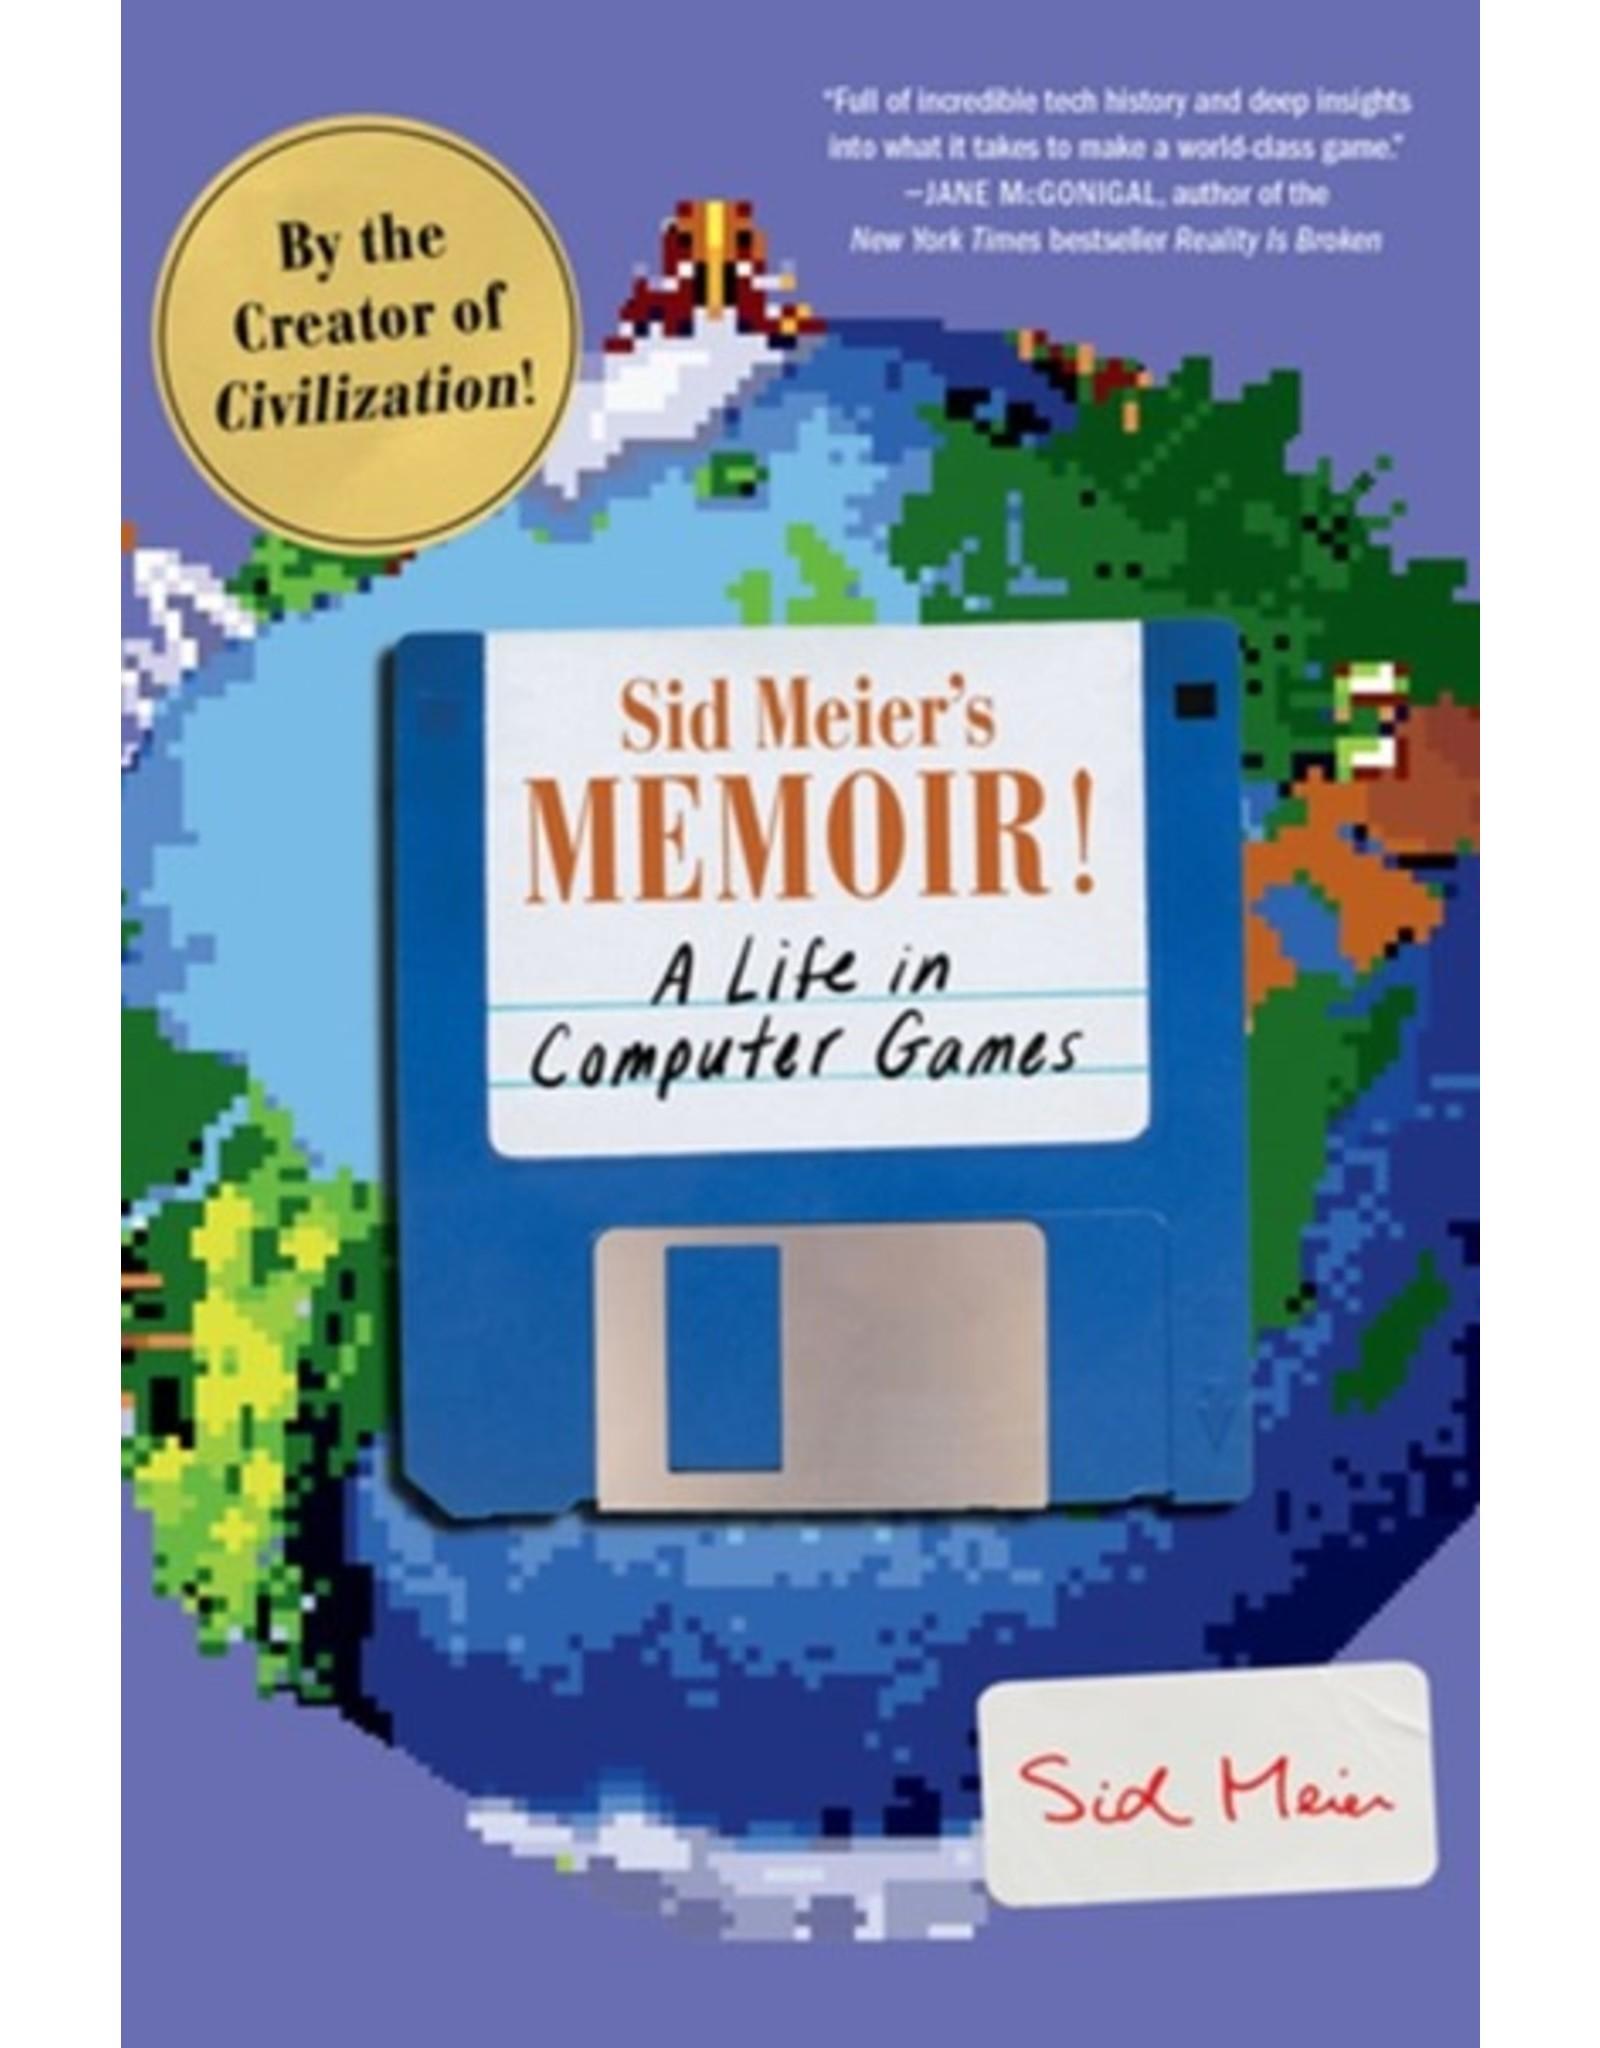 Books Sid Meier's Memoir : A Life in Computer Games by Sid Meier